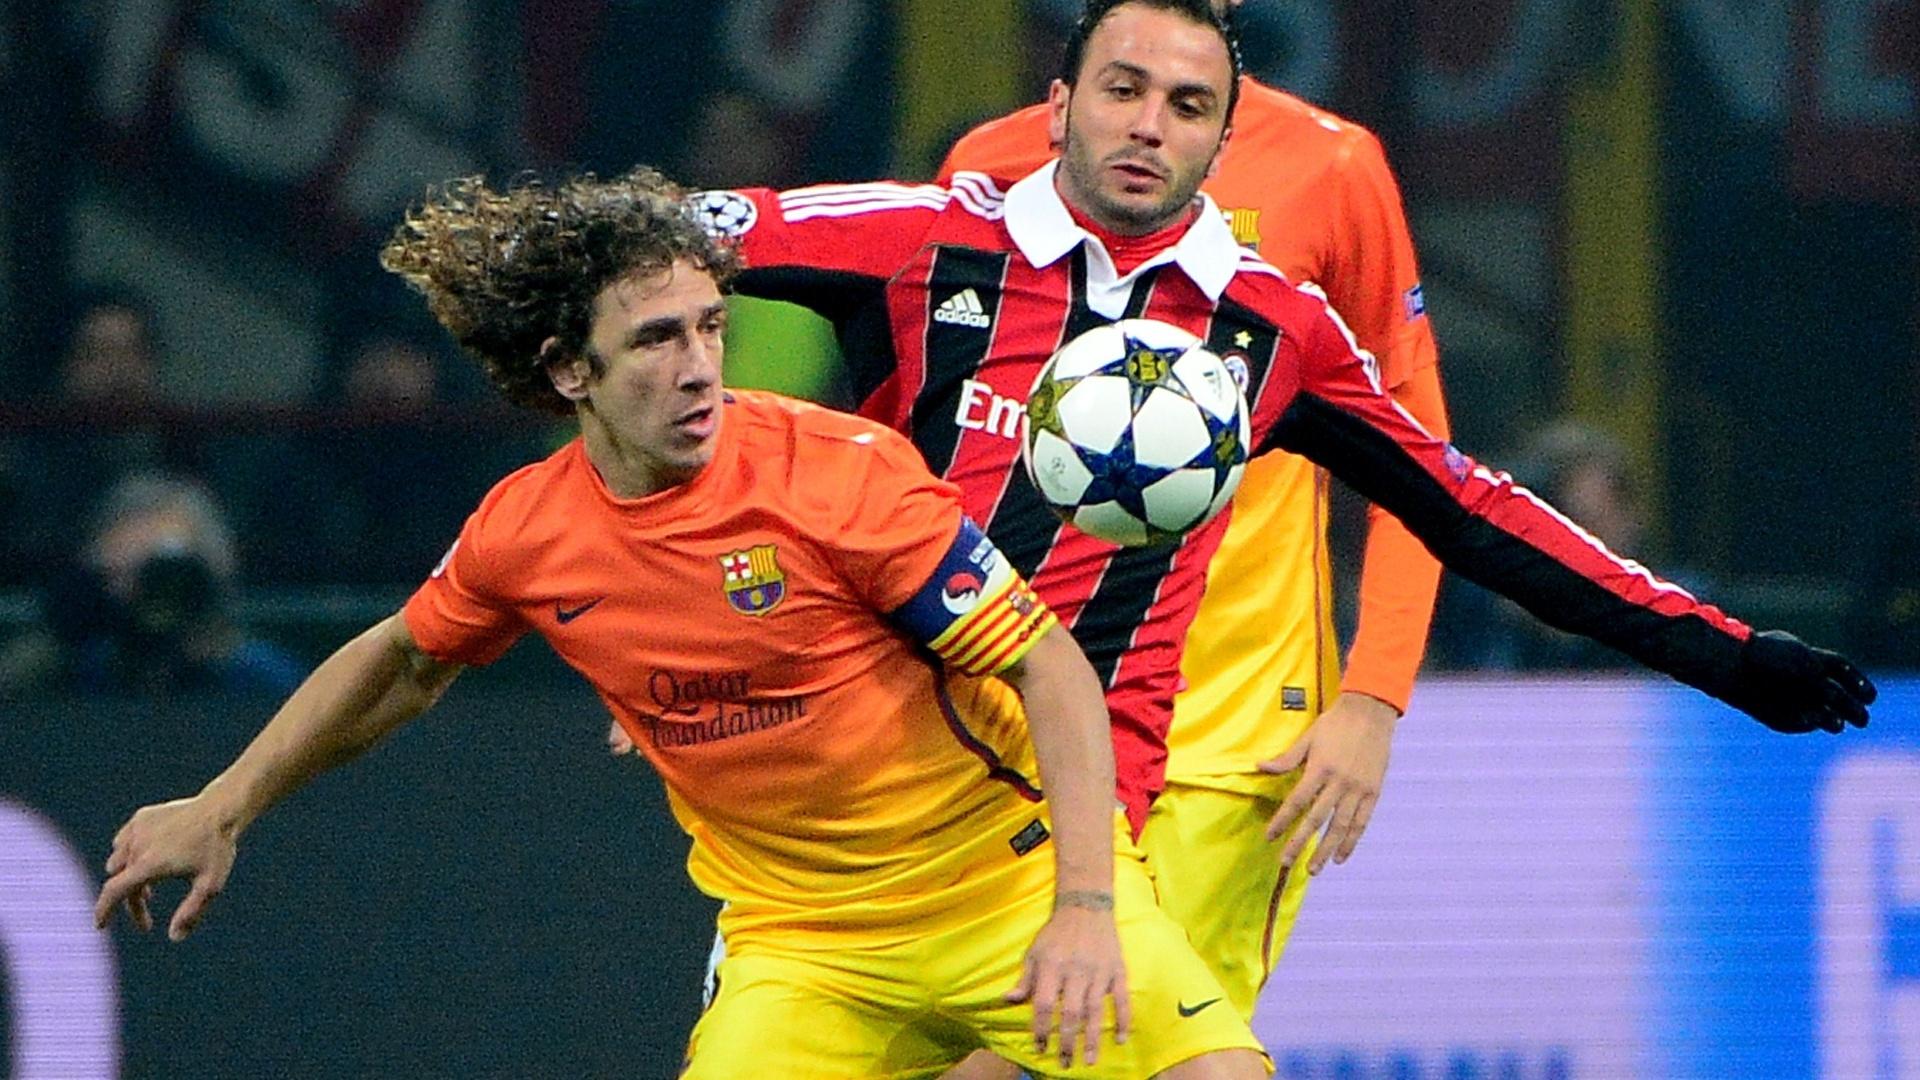 20.fev.2013 - Atacante Pazzini, do Milan, disputa bola com o zagueiro Puyol, do Barcelona